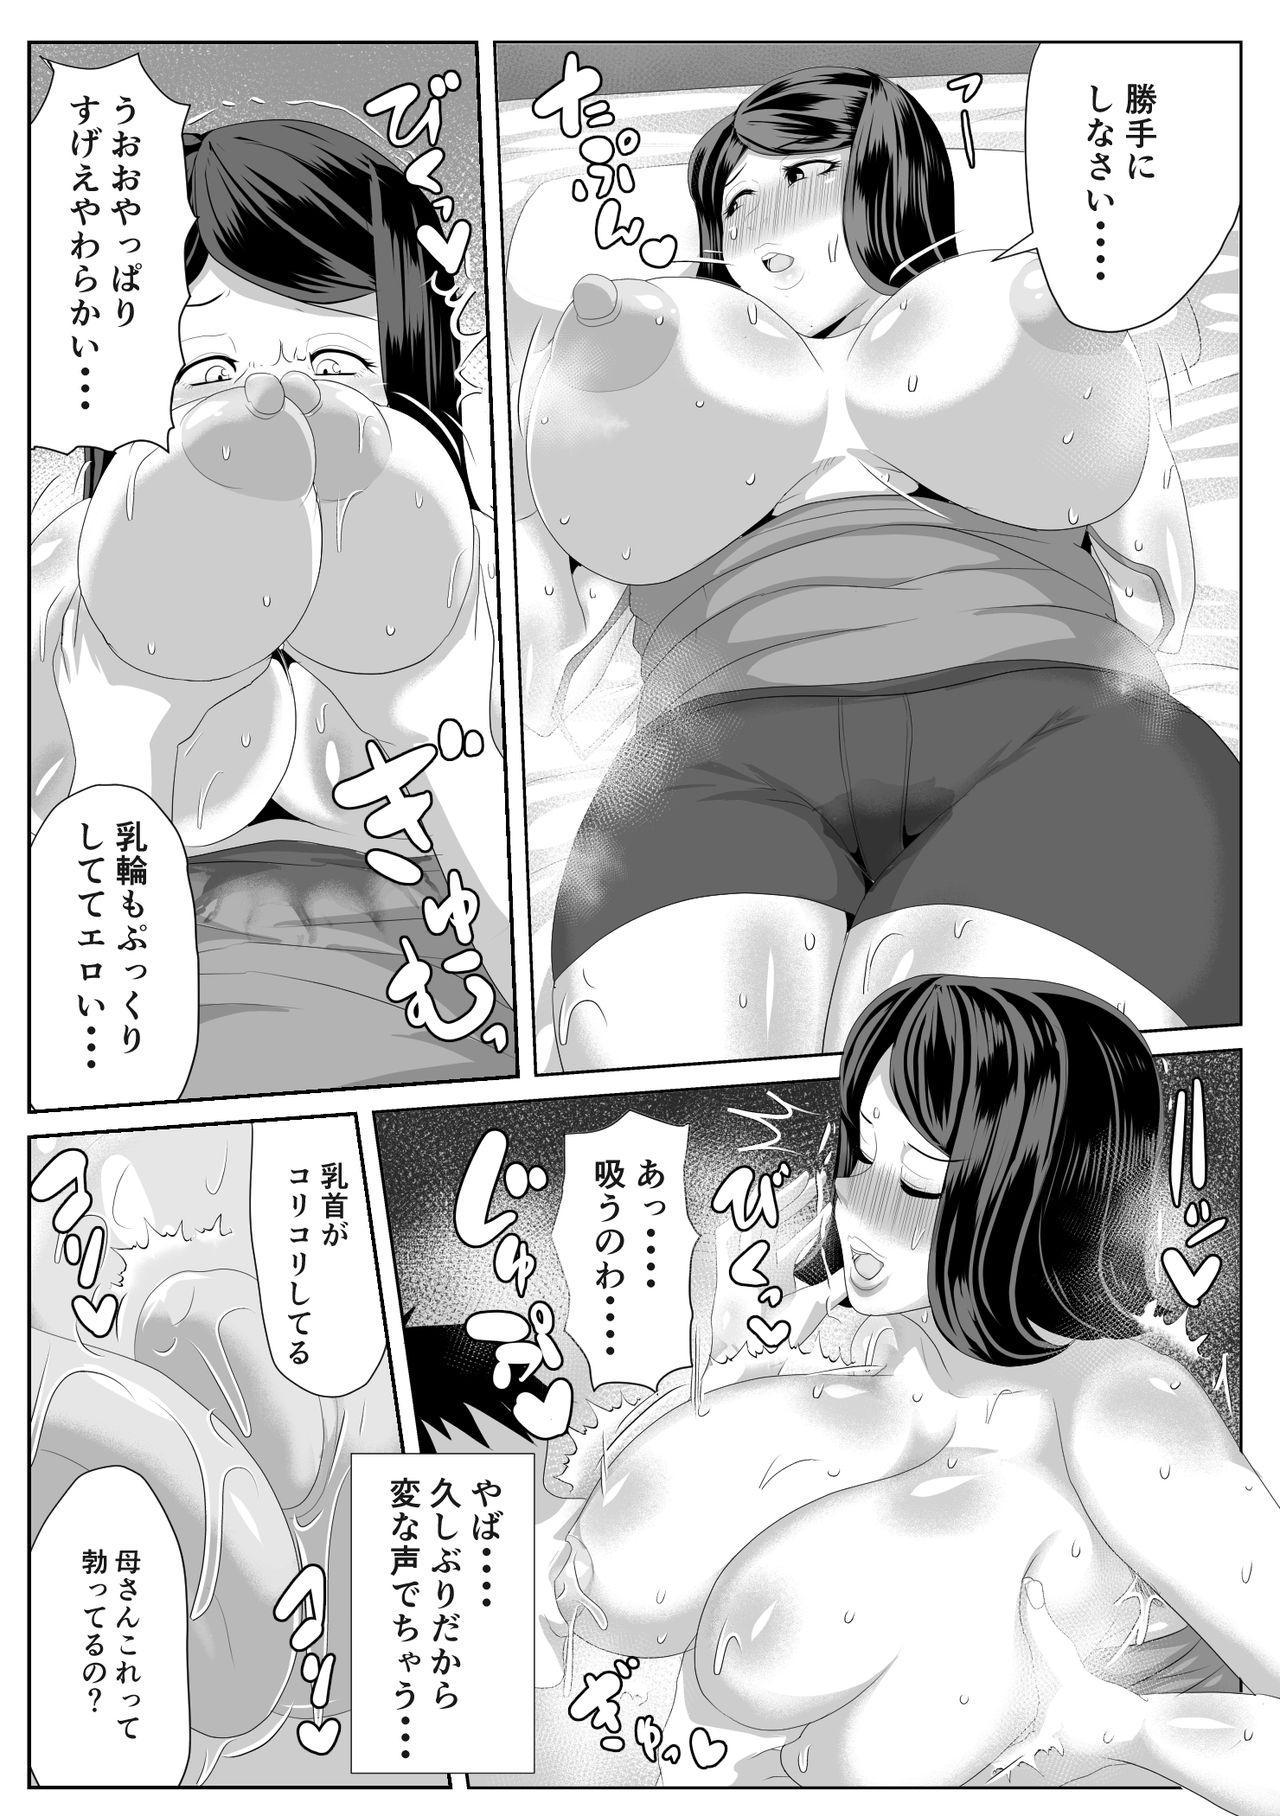 Kaa-san to Atsui Isshuukan 9